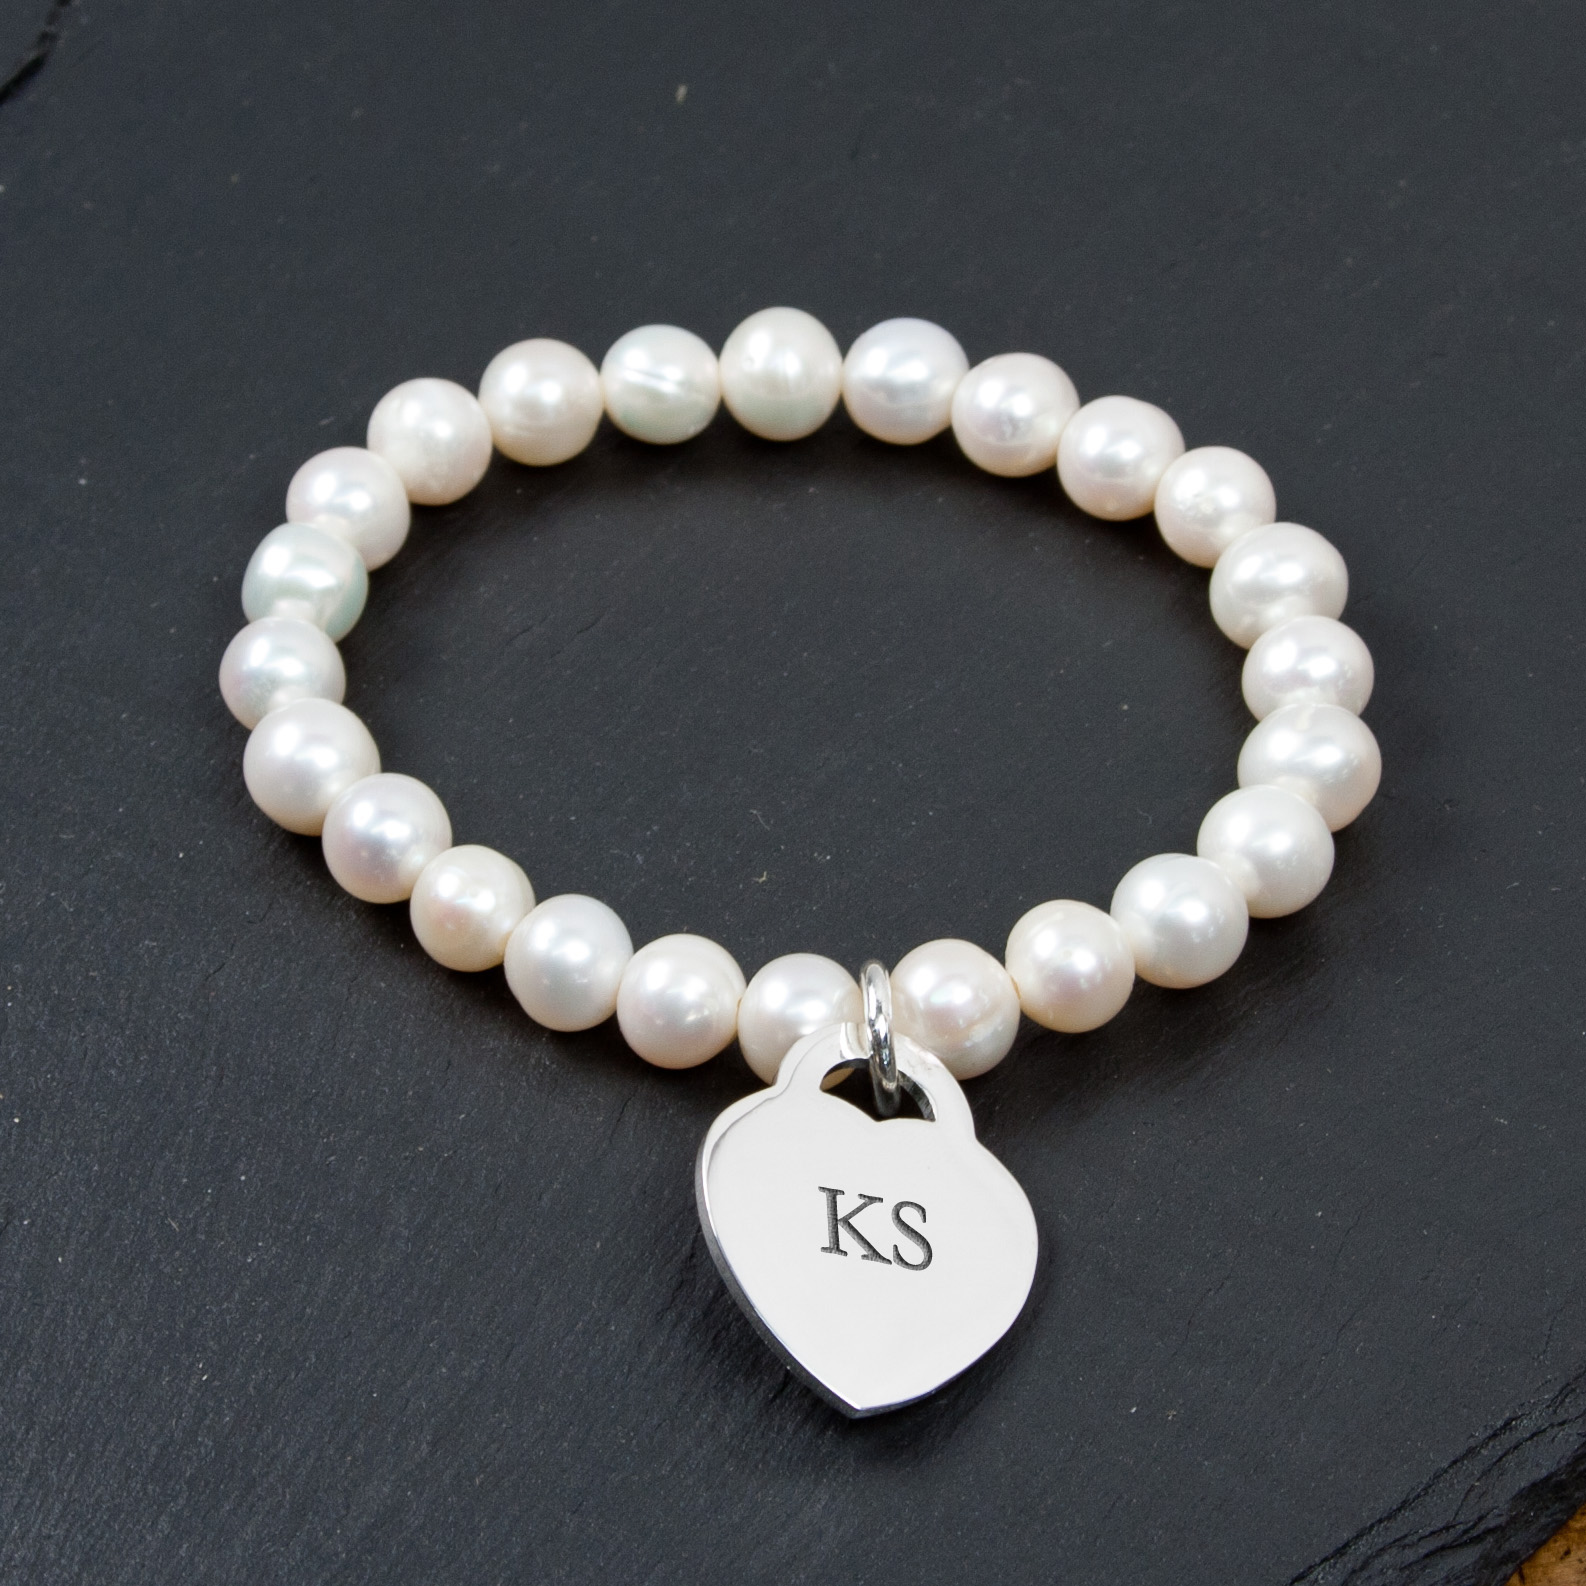 Engraved pearl bracelet